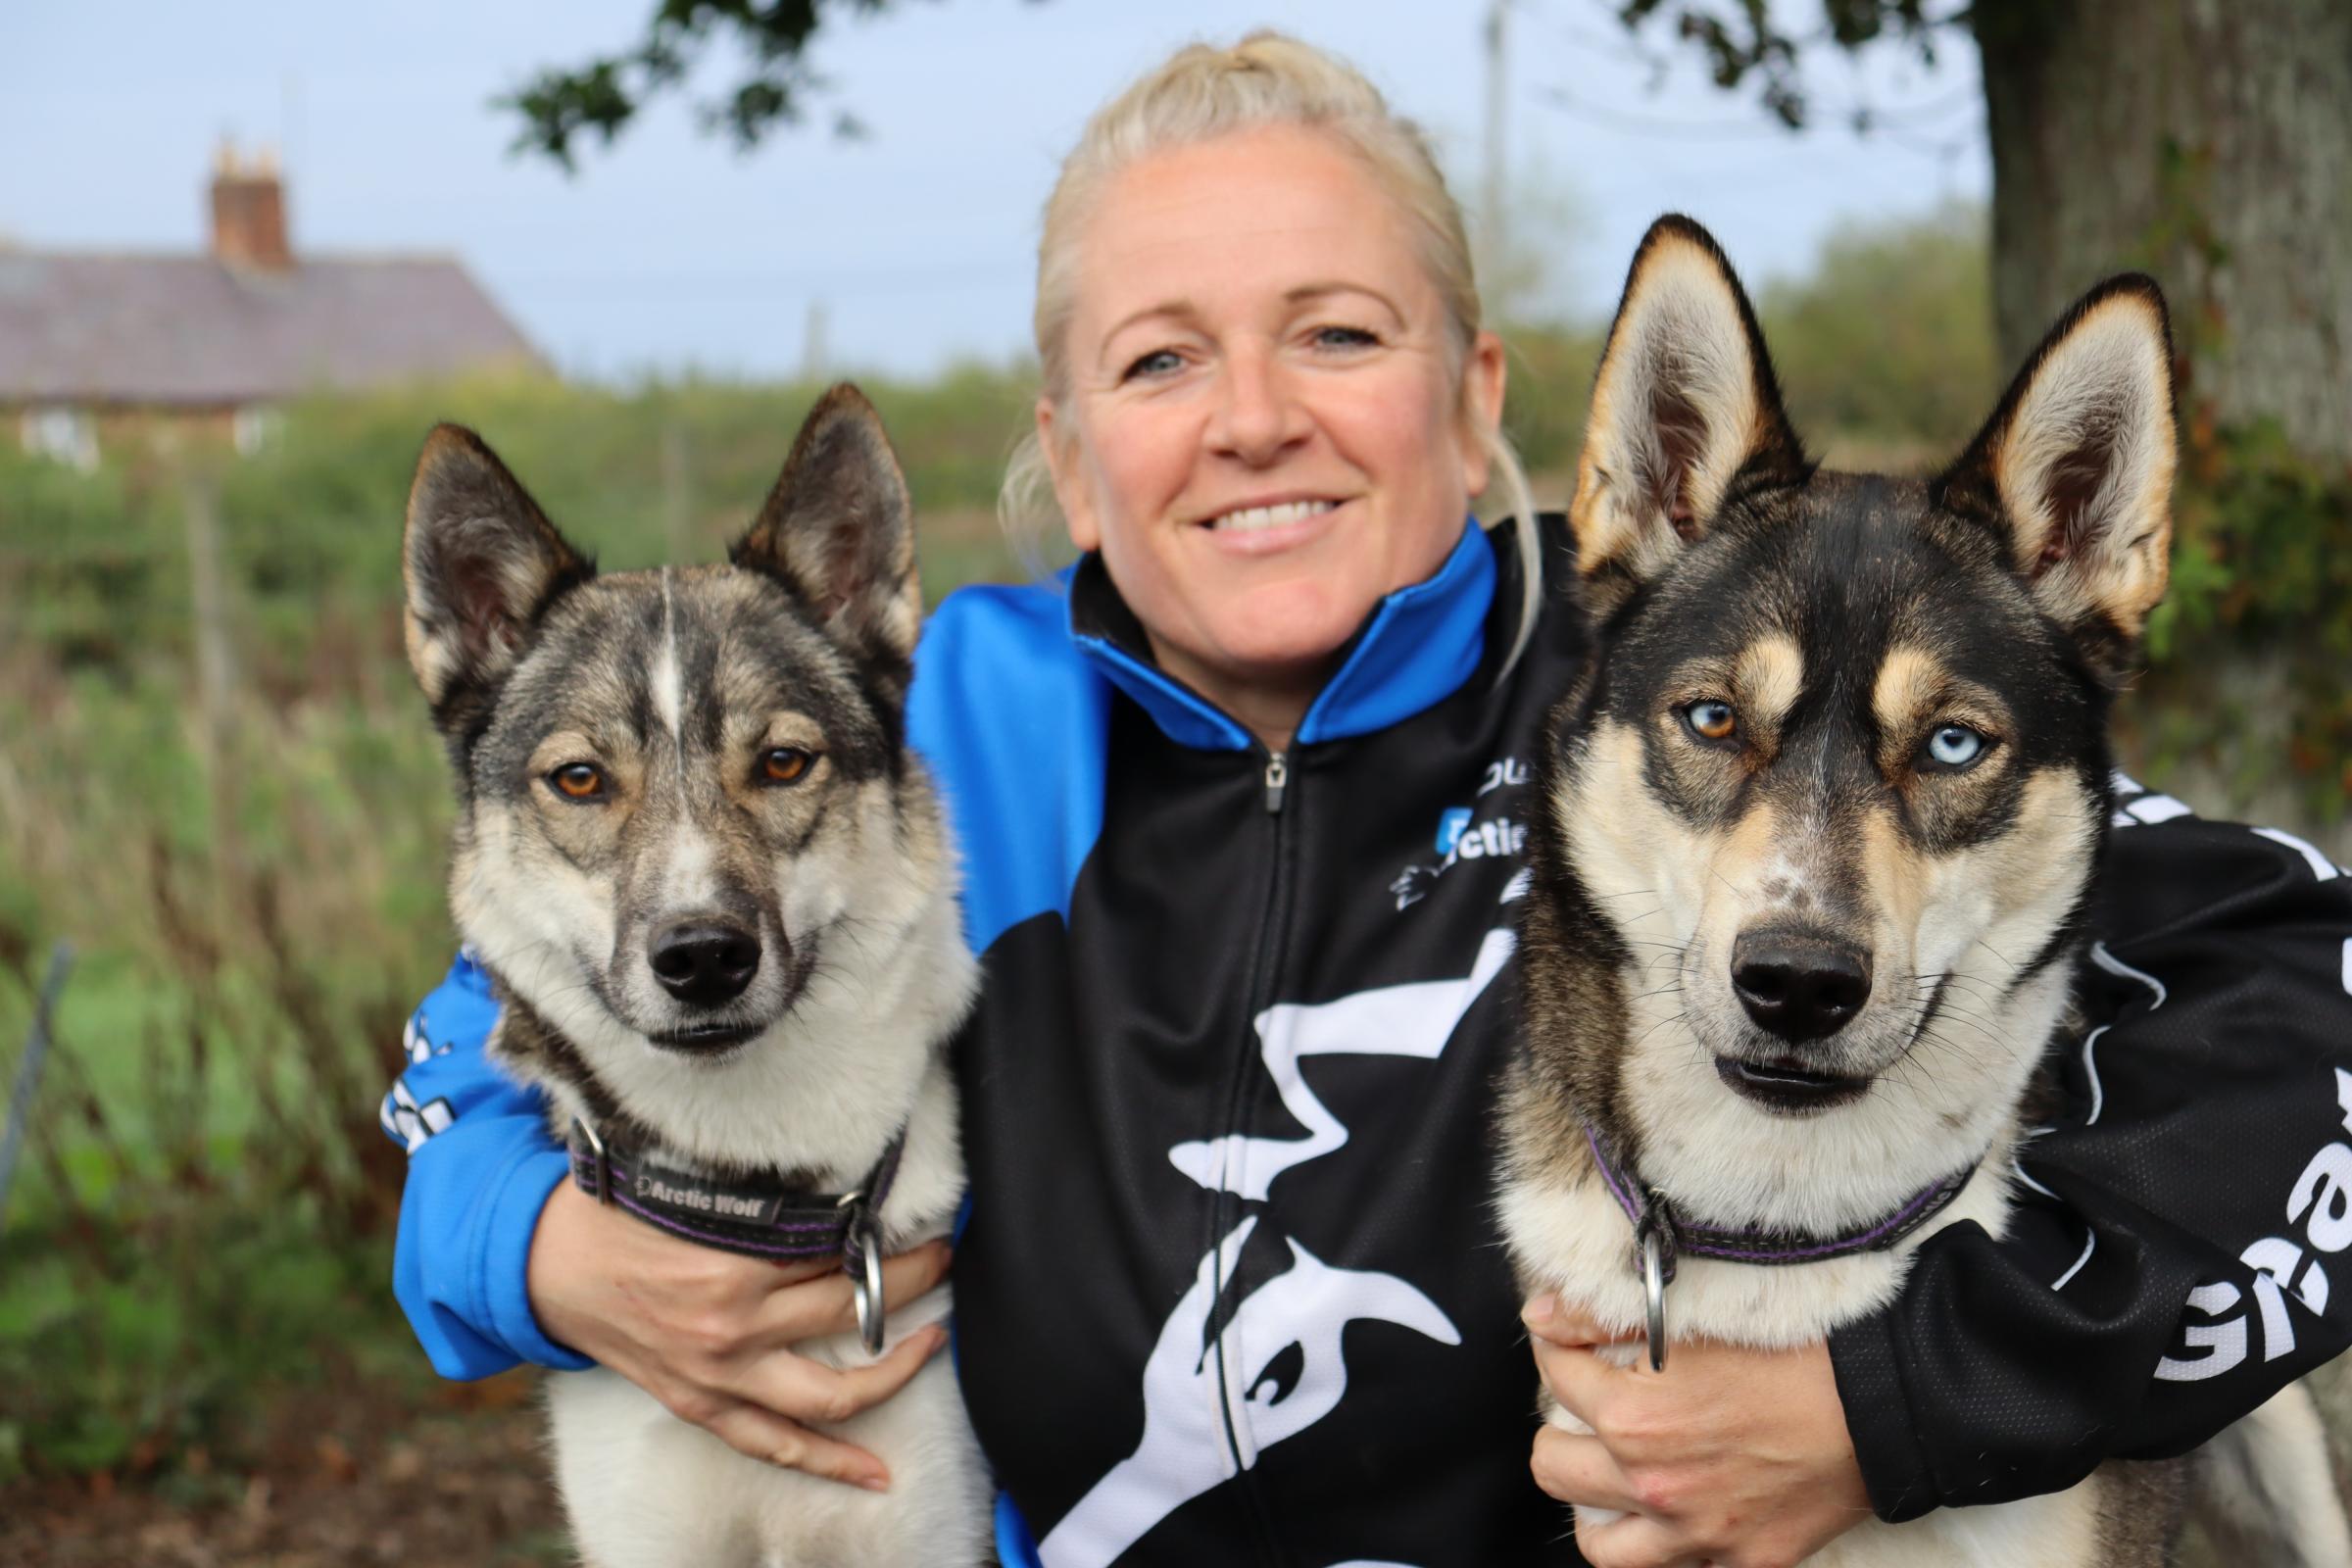 Swindon dog trainer takes part in world dog sledding championship